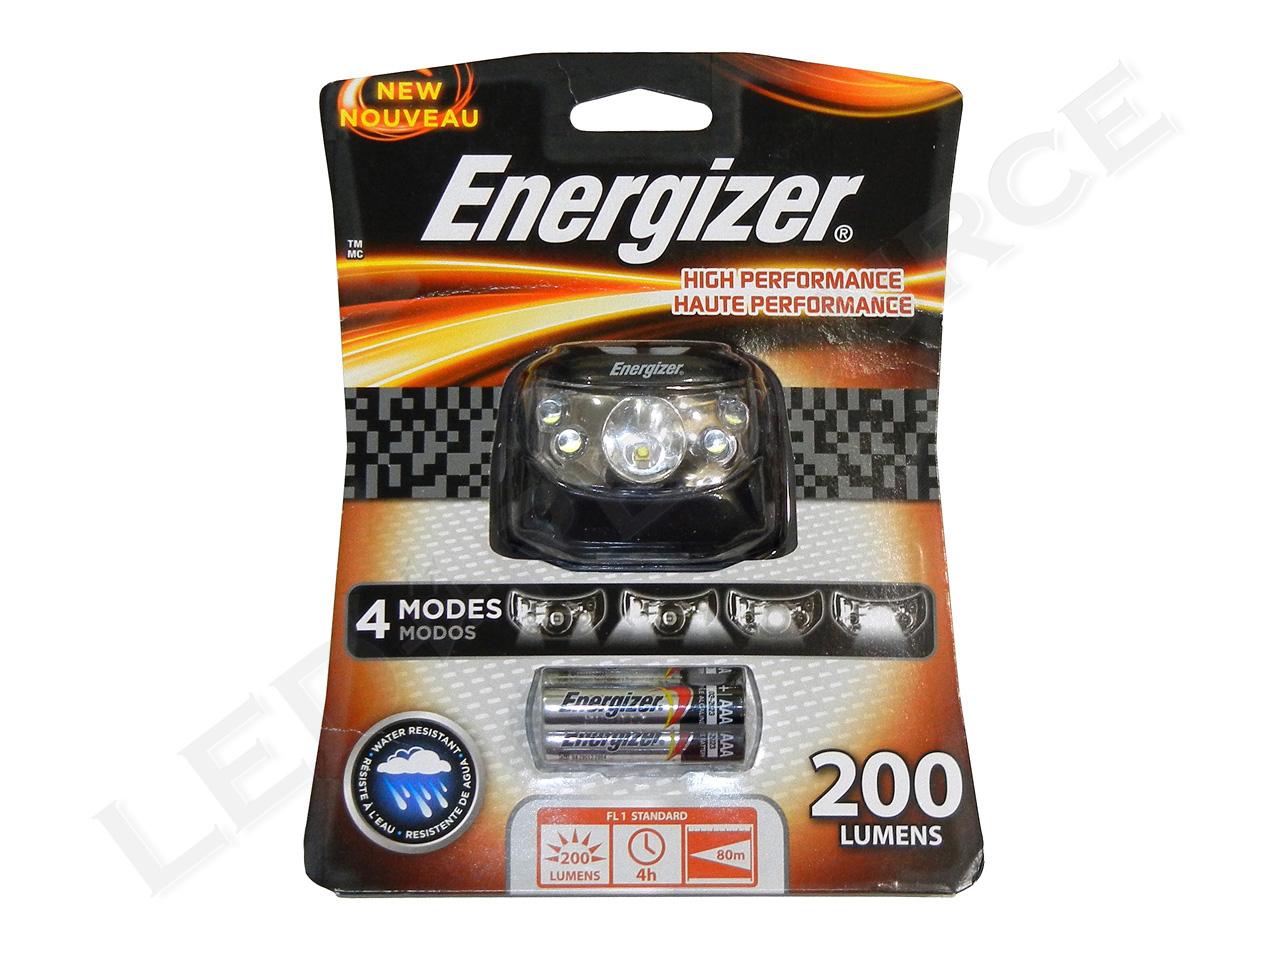 Energizer Headlamp Review